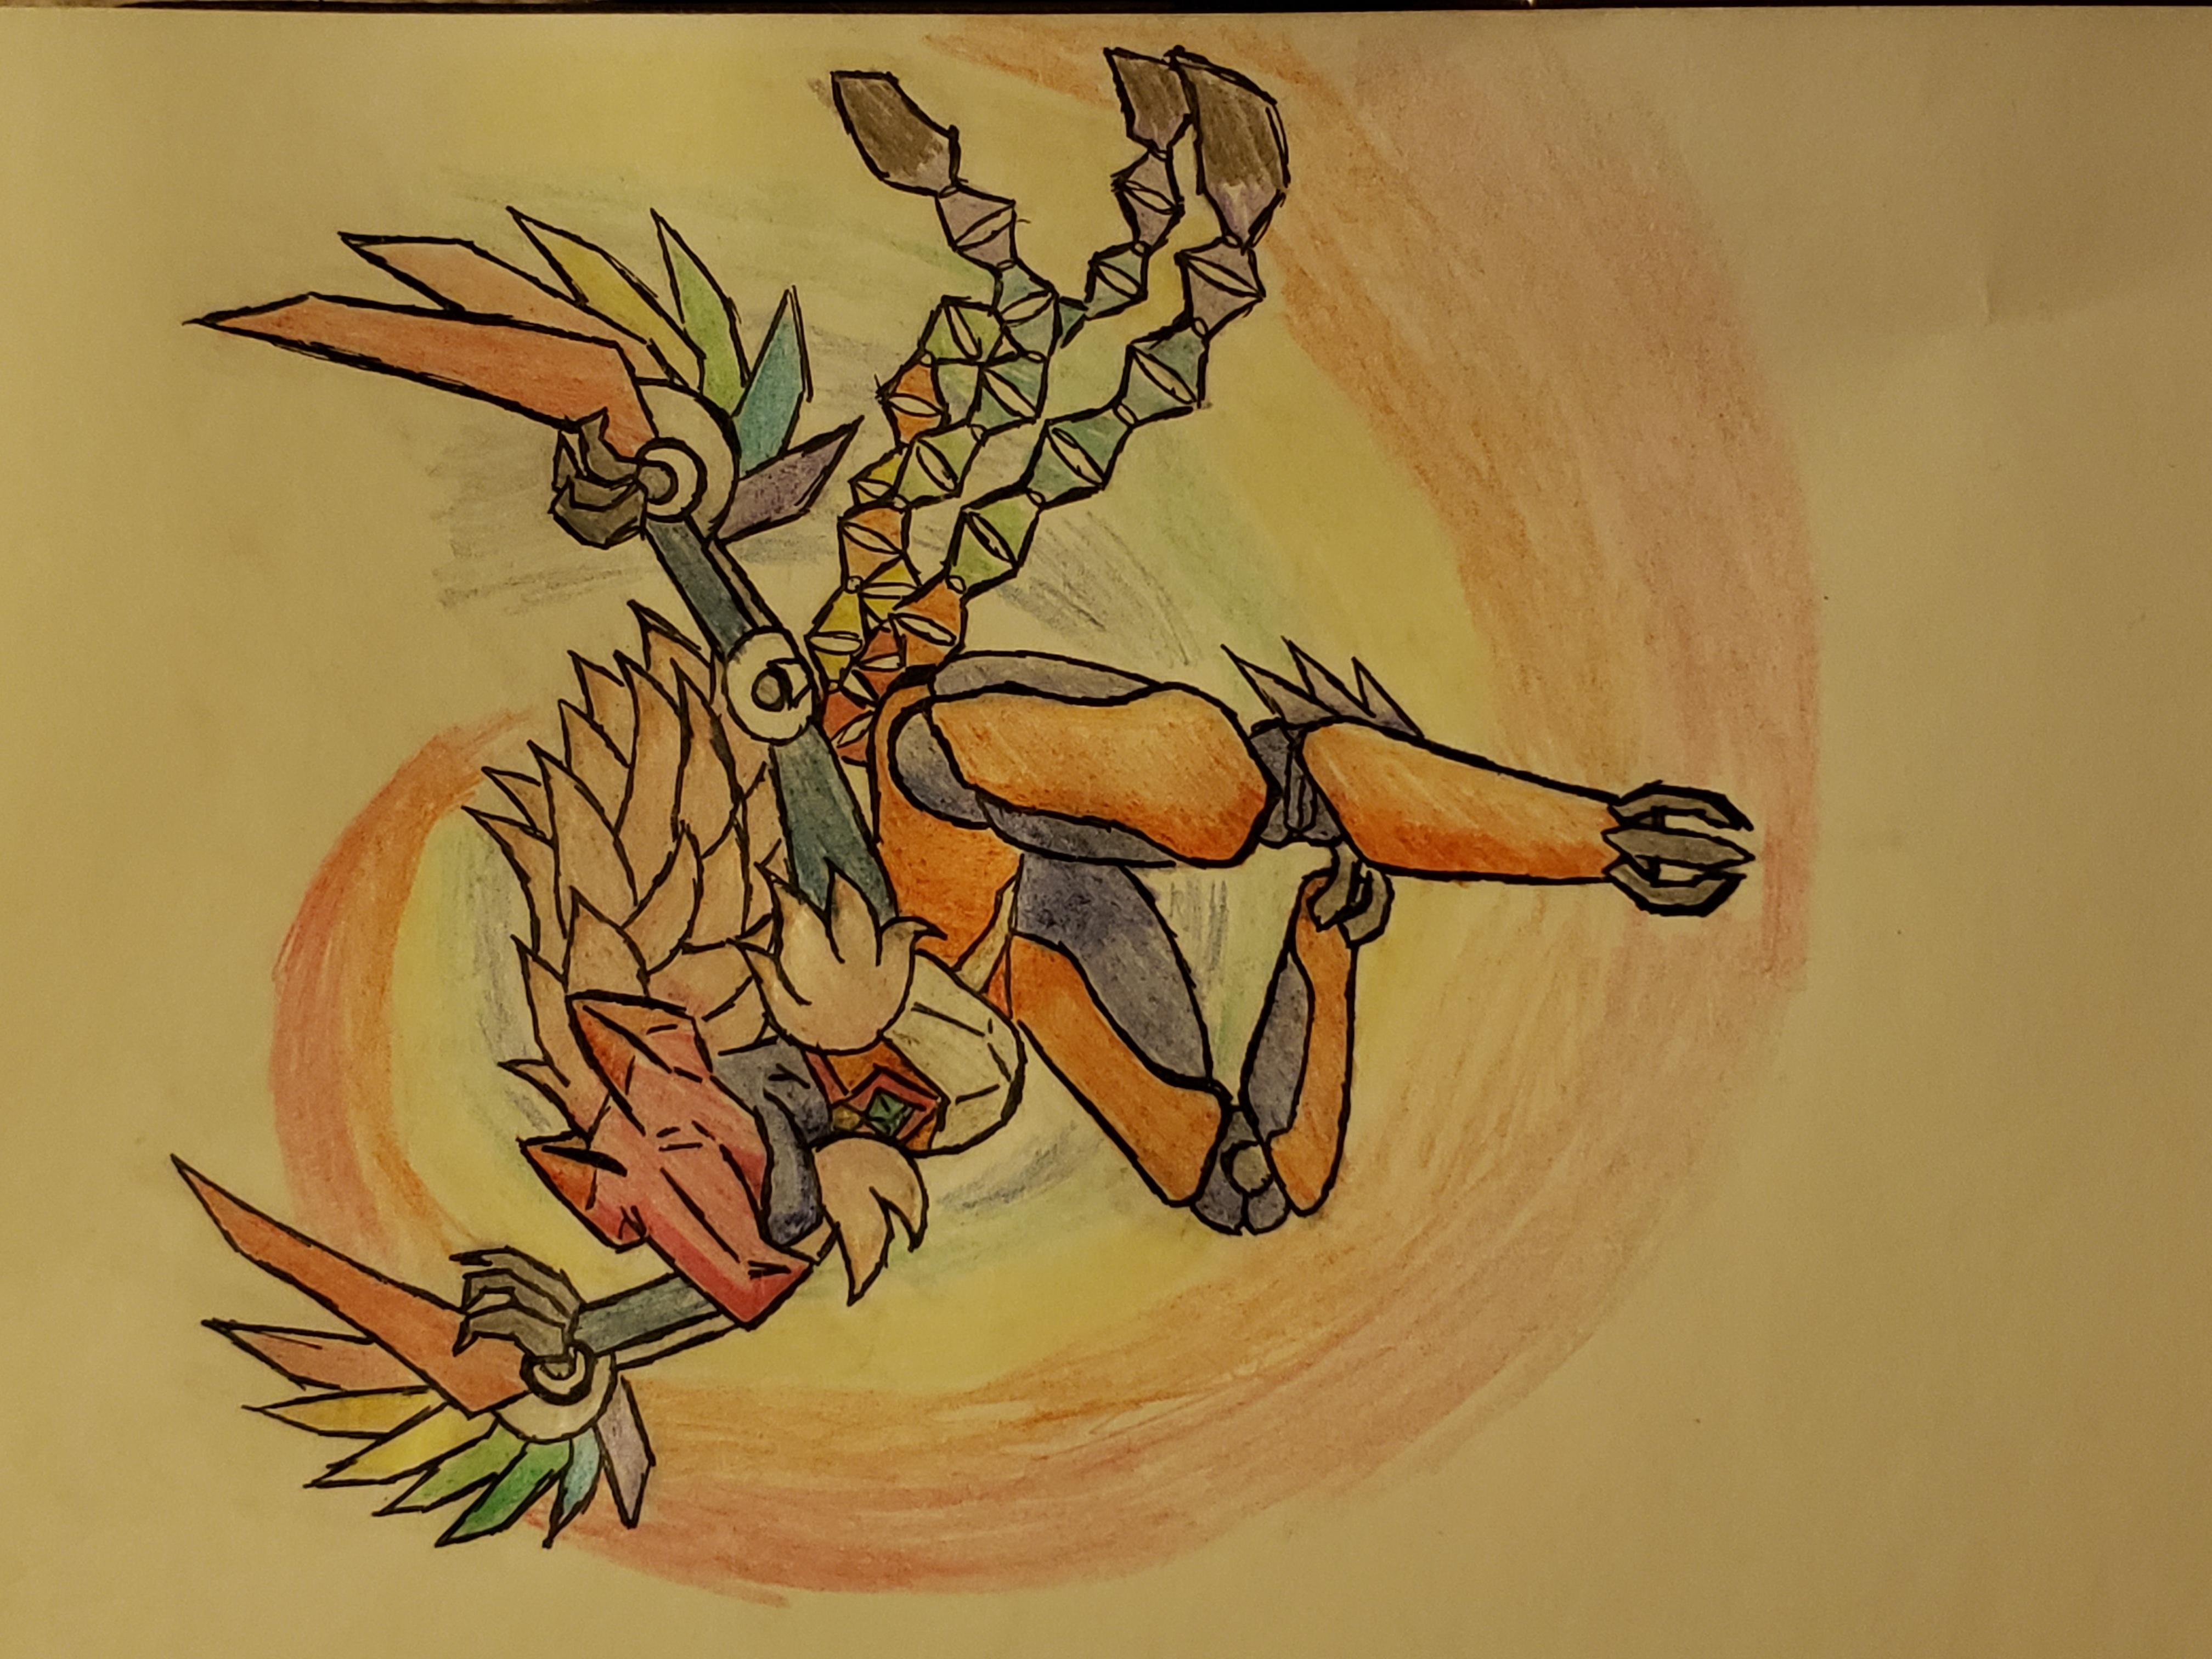 Mecha Harpy